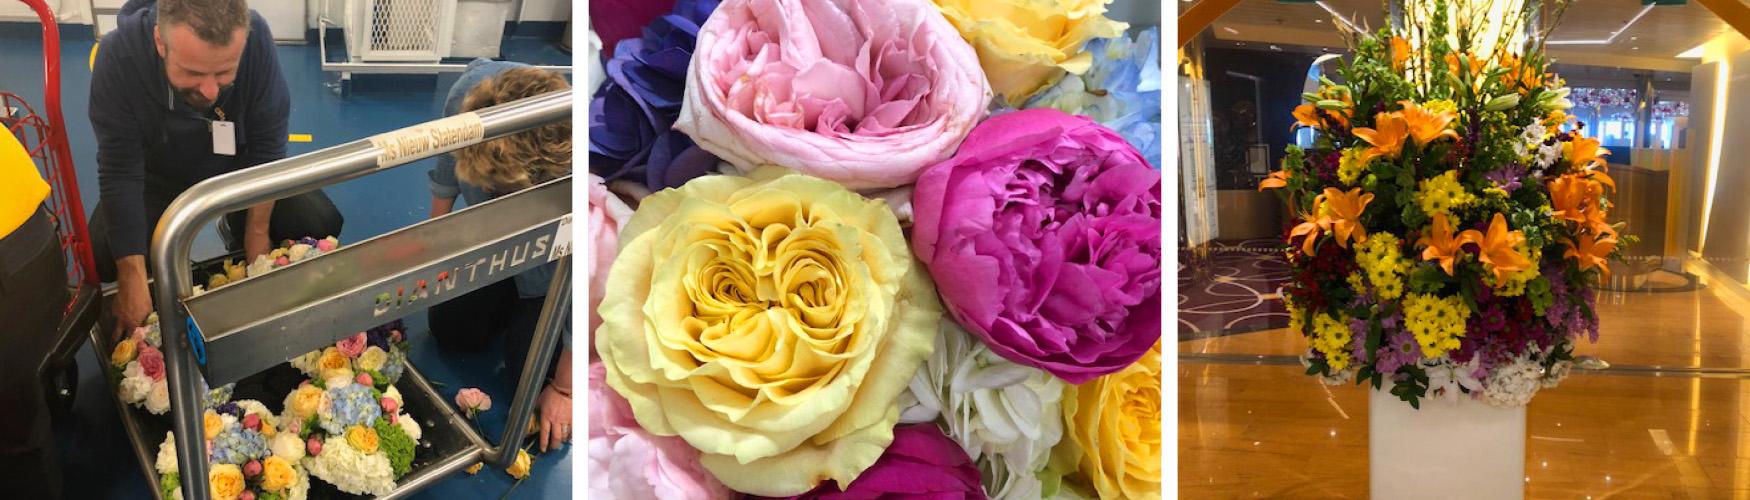 Cruise-Ship-Flowers-Oprah-Holland-America-6.jpg